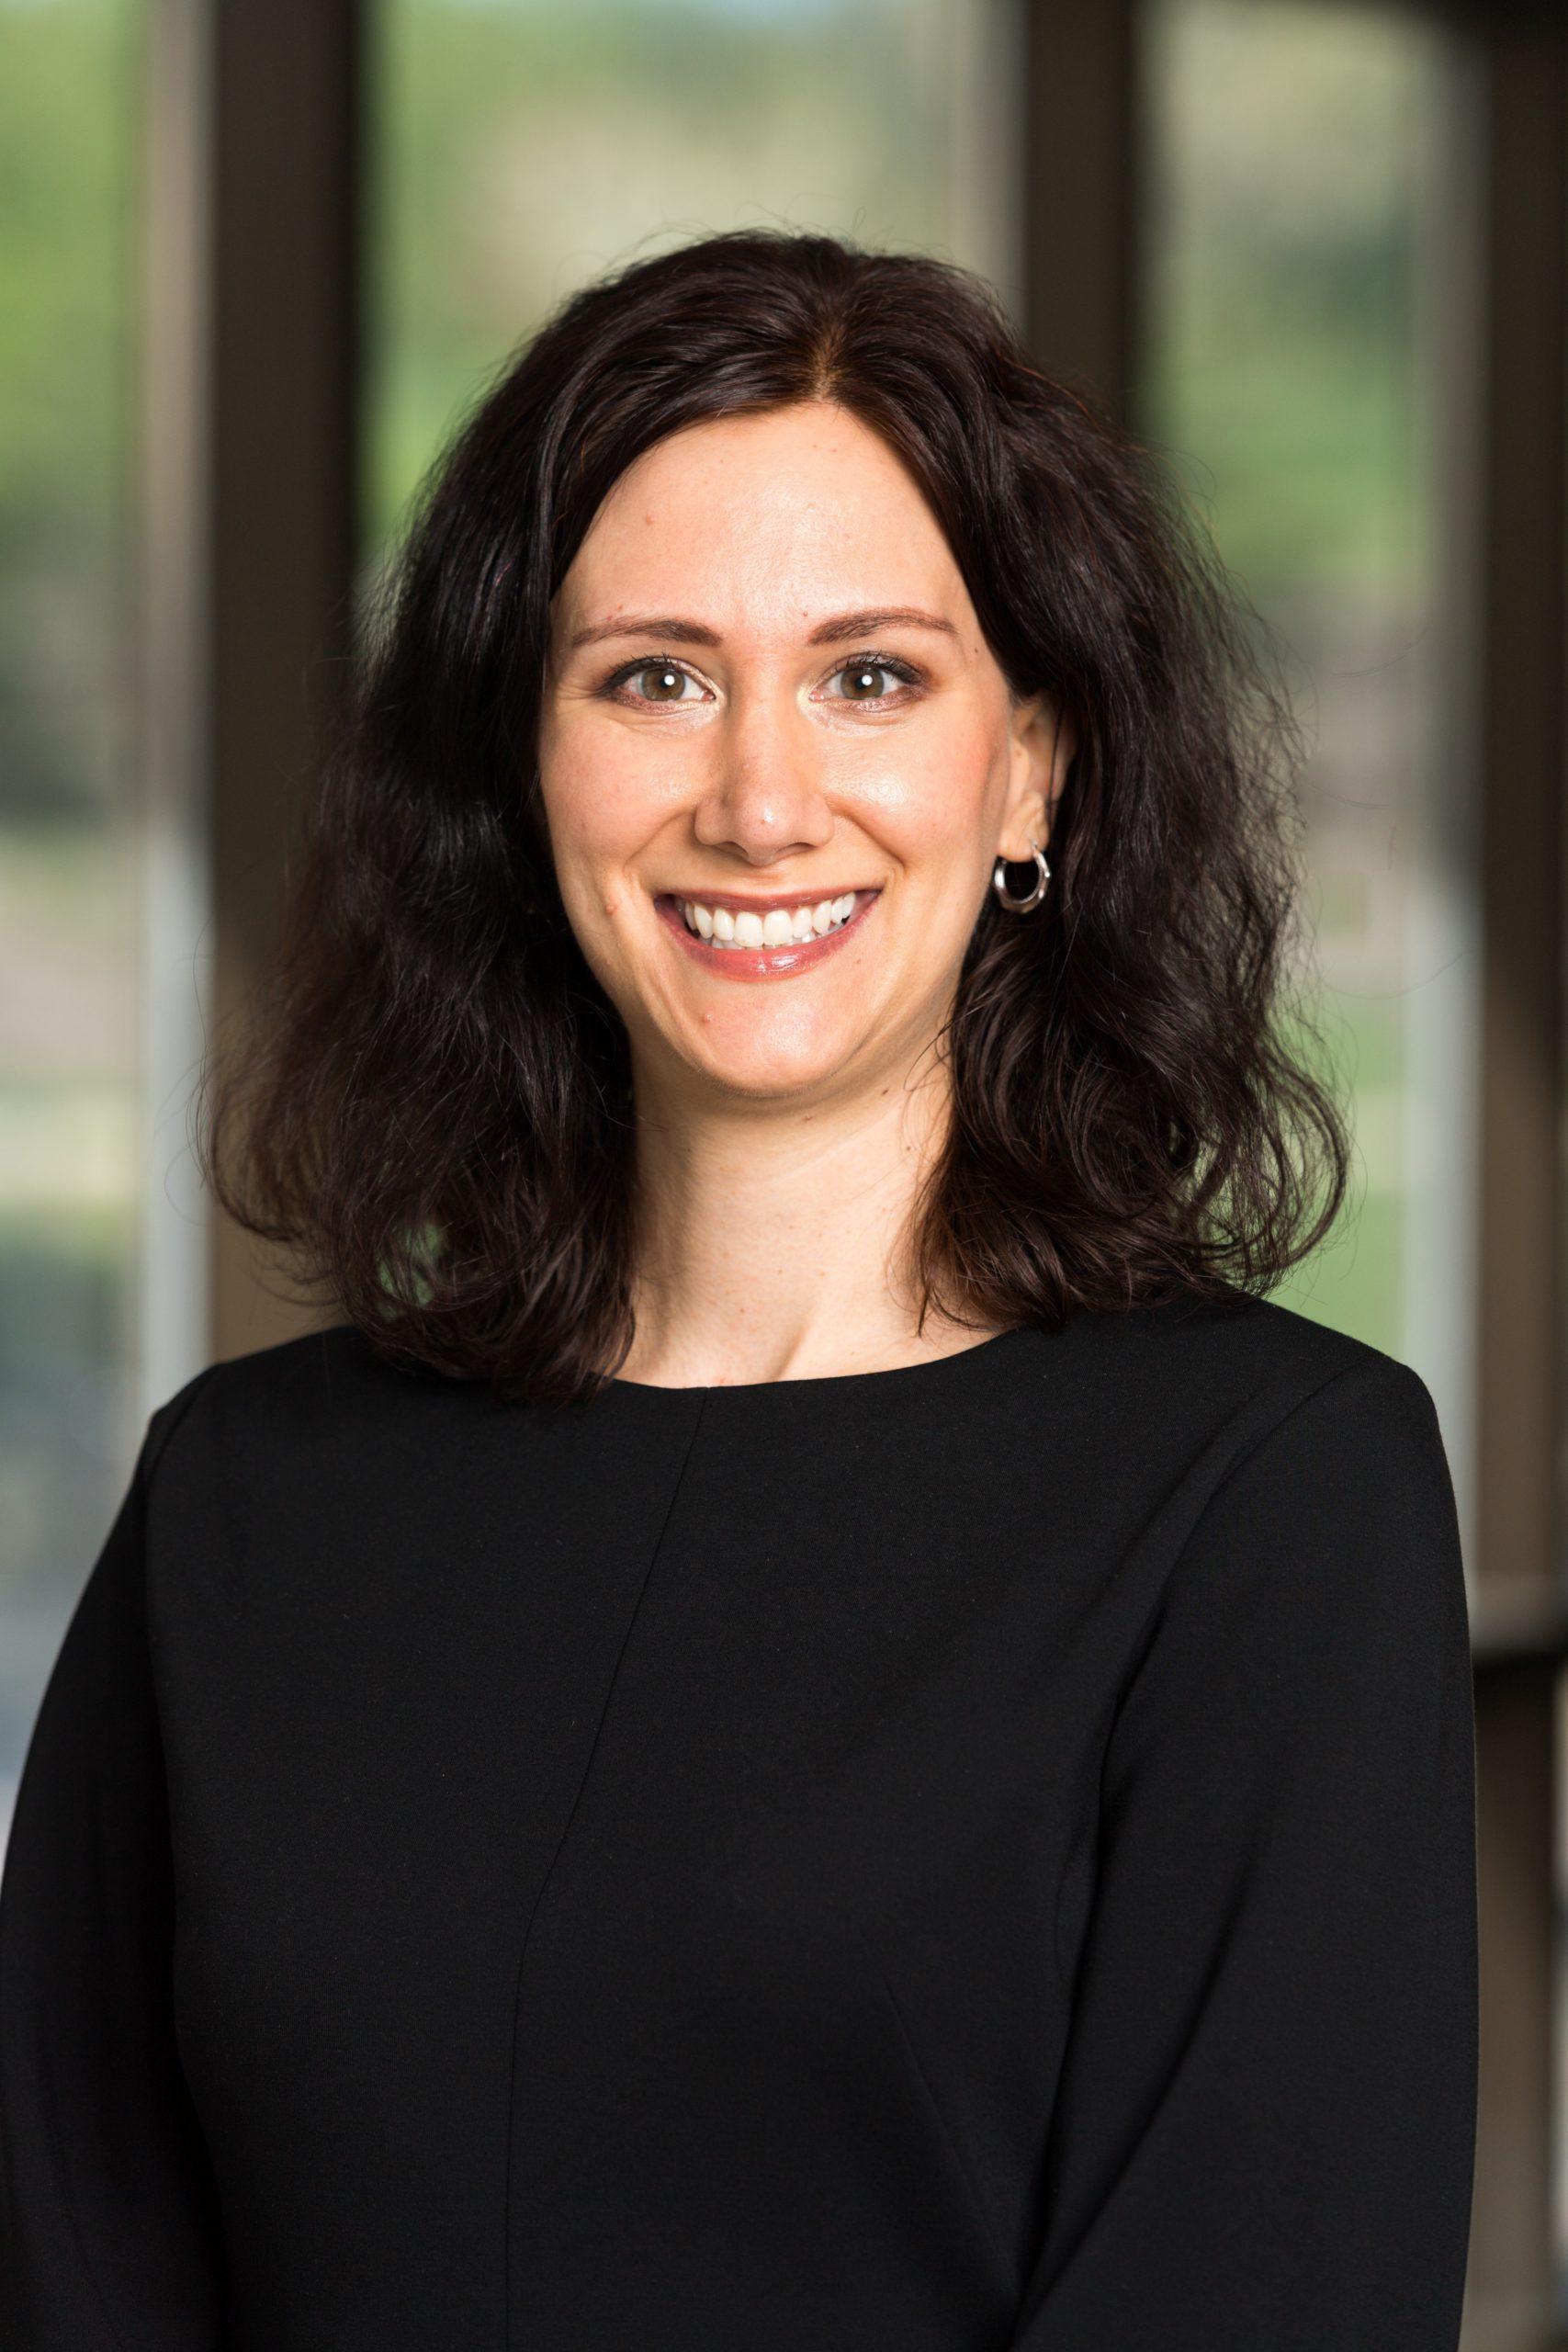 Courtney Allyn Polenick